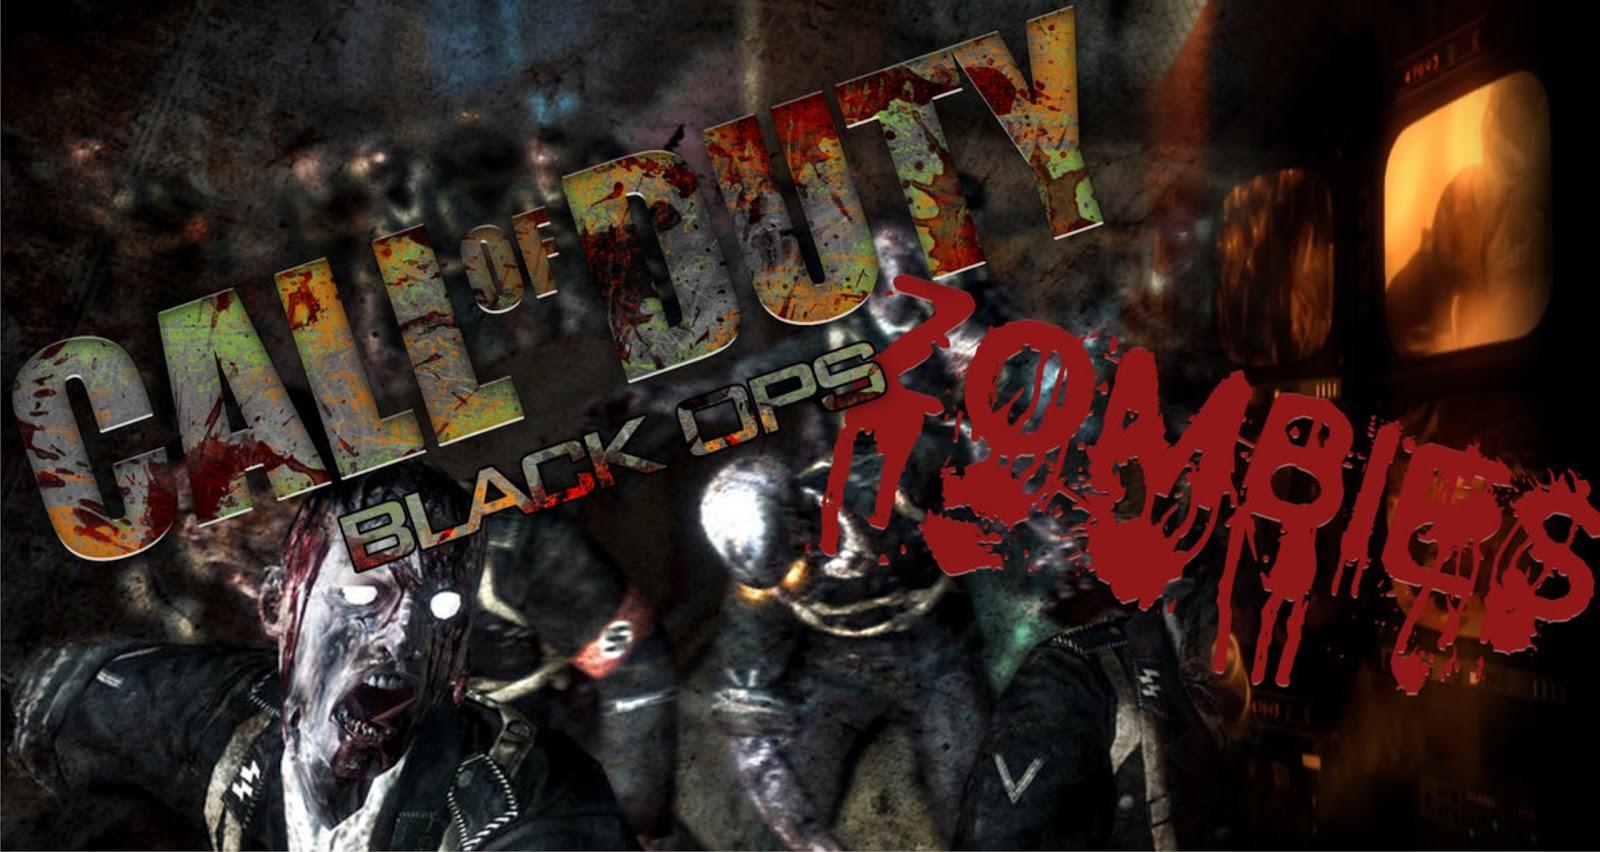 http://1.bp.blogspot.com/-S85AEA71Ng8/TfSF5z2OGkI/AAAAAAAAAG4/a7BrOd9rSaM/s1600/Black%2Bops%2BZombies%2BCall%2Bof%2BDuty%2BBlack%2Bops%2BGallery.jpg